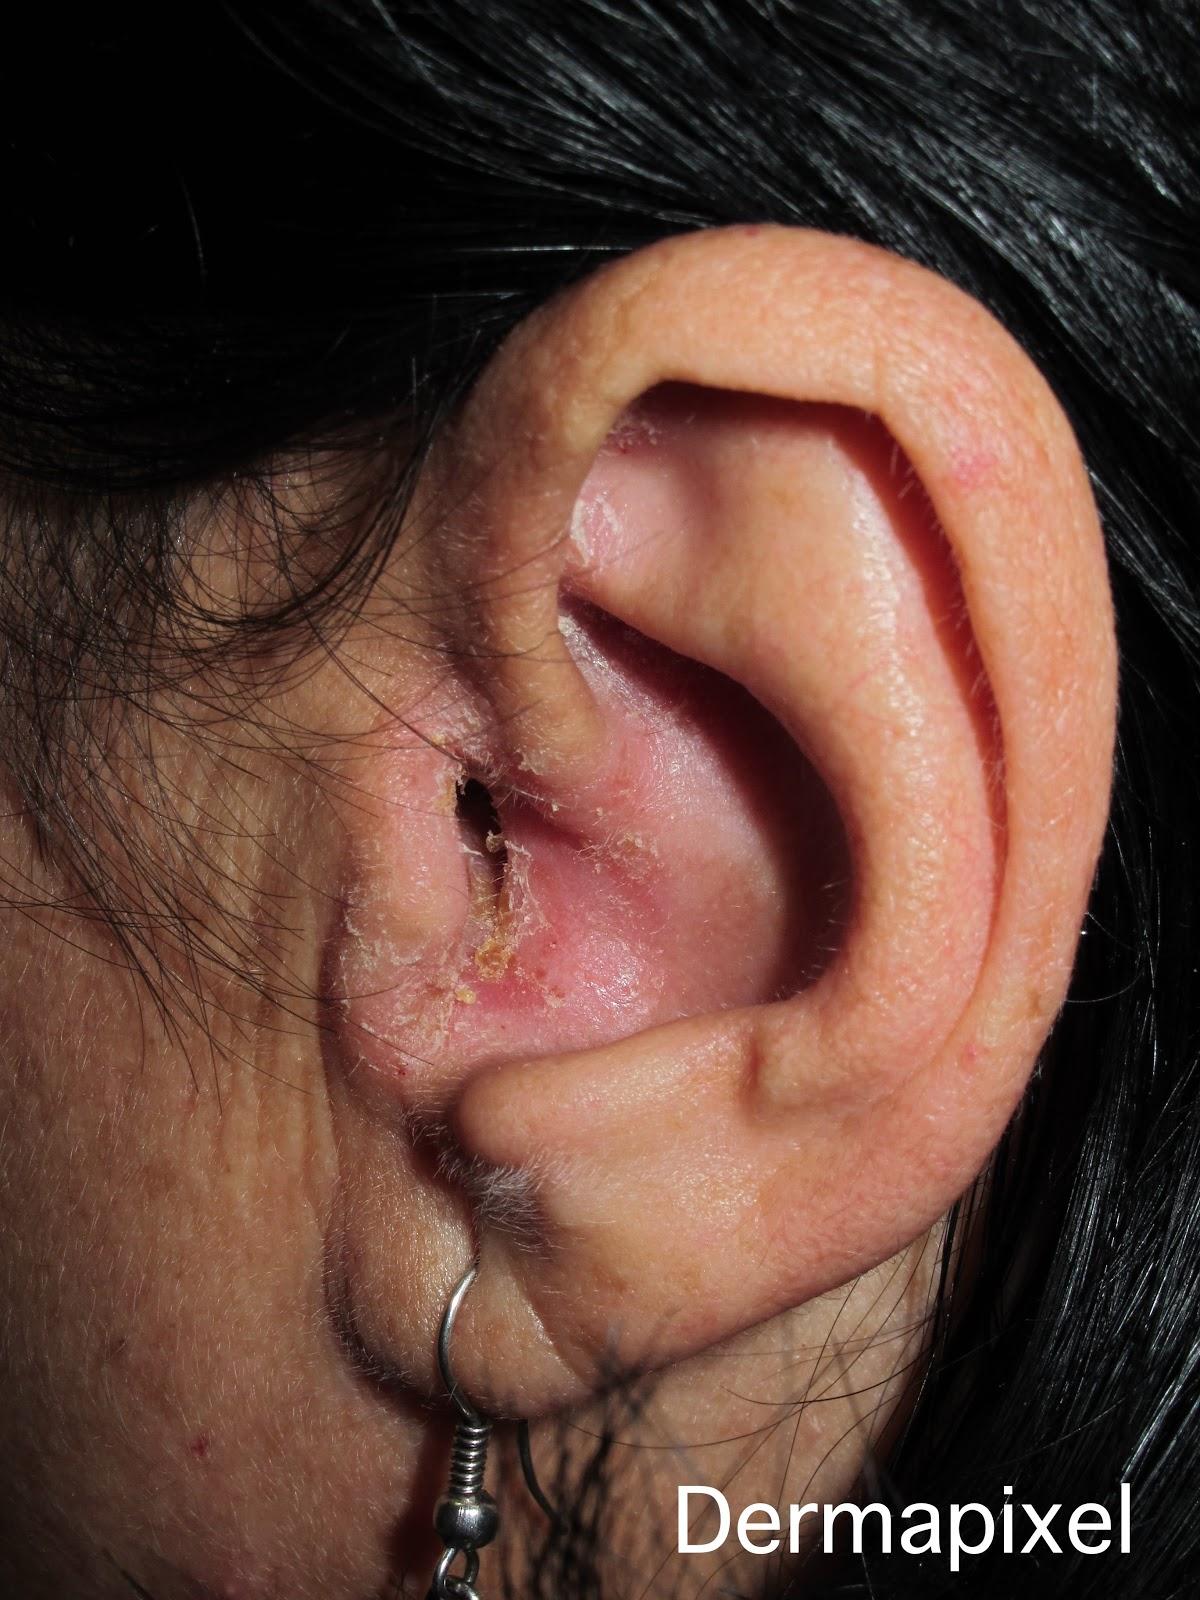 Picor de oídos